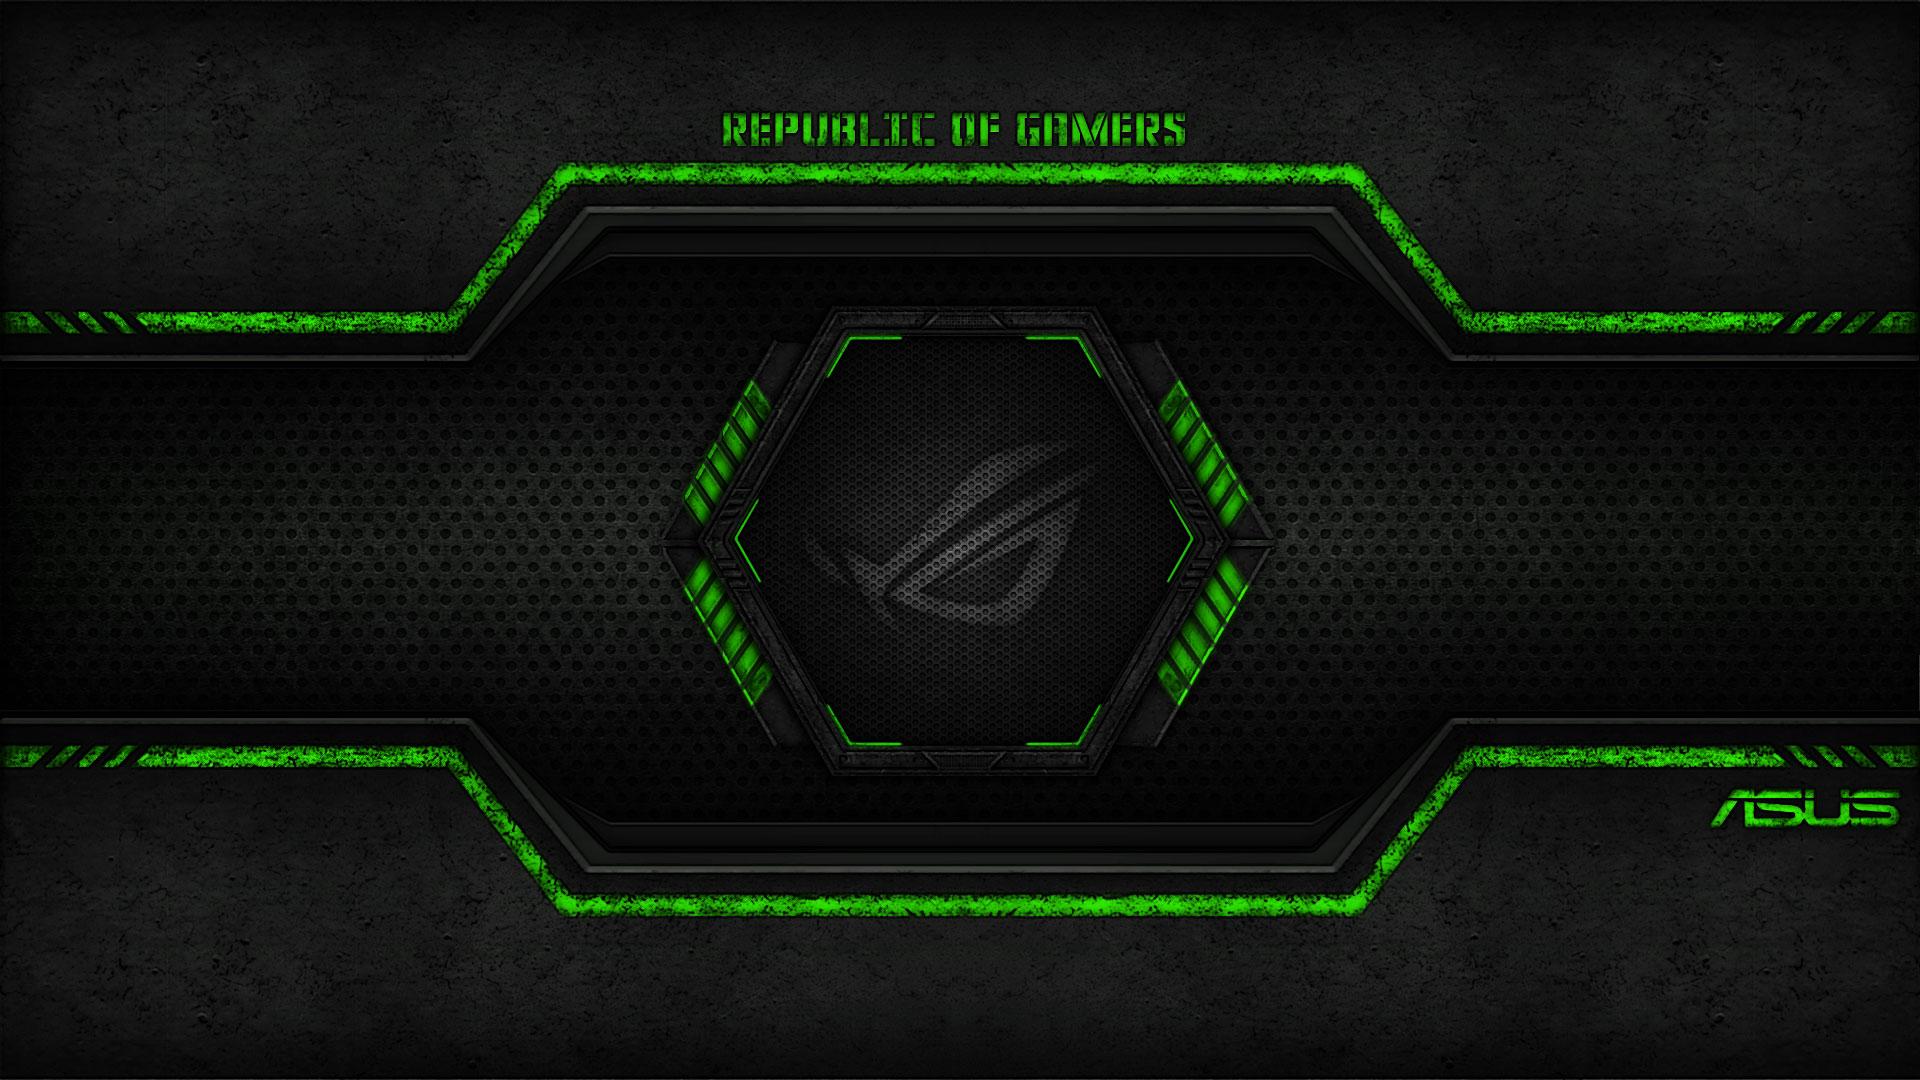 Asus Green Wallpaper: Papel De Parede Grátis Para PC E Celular